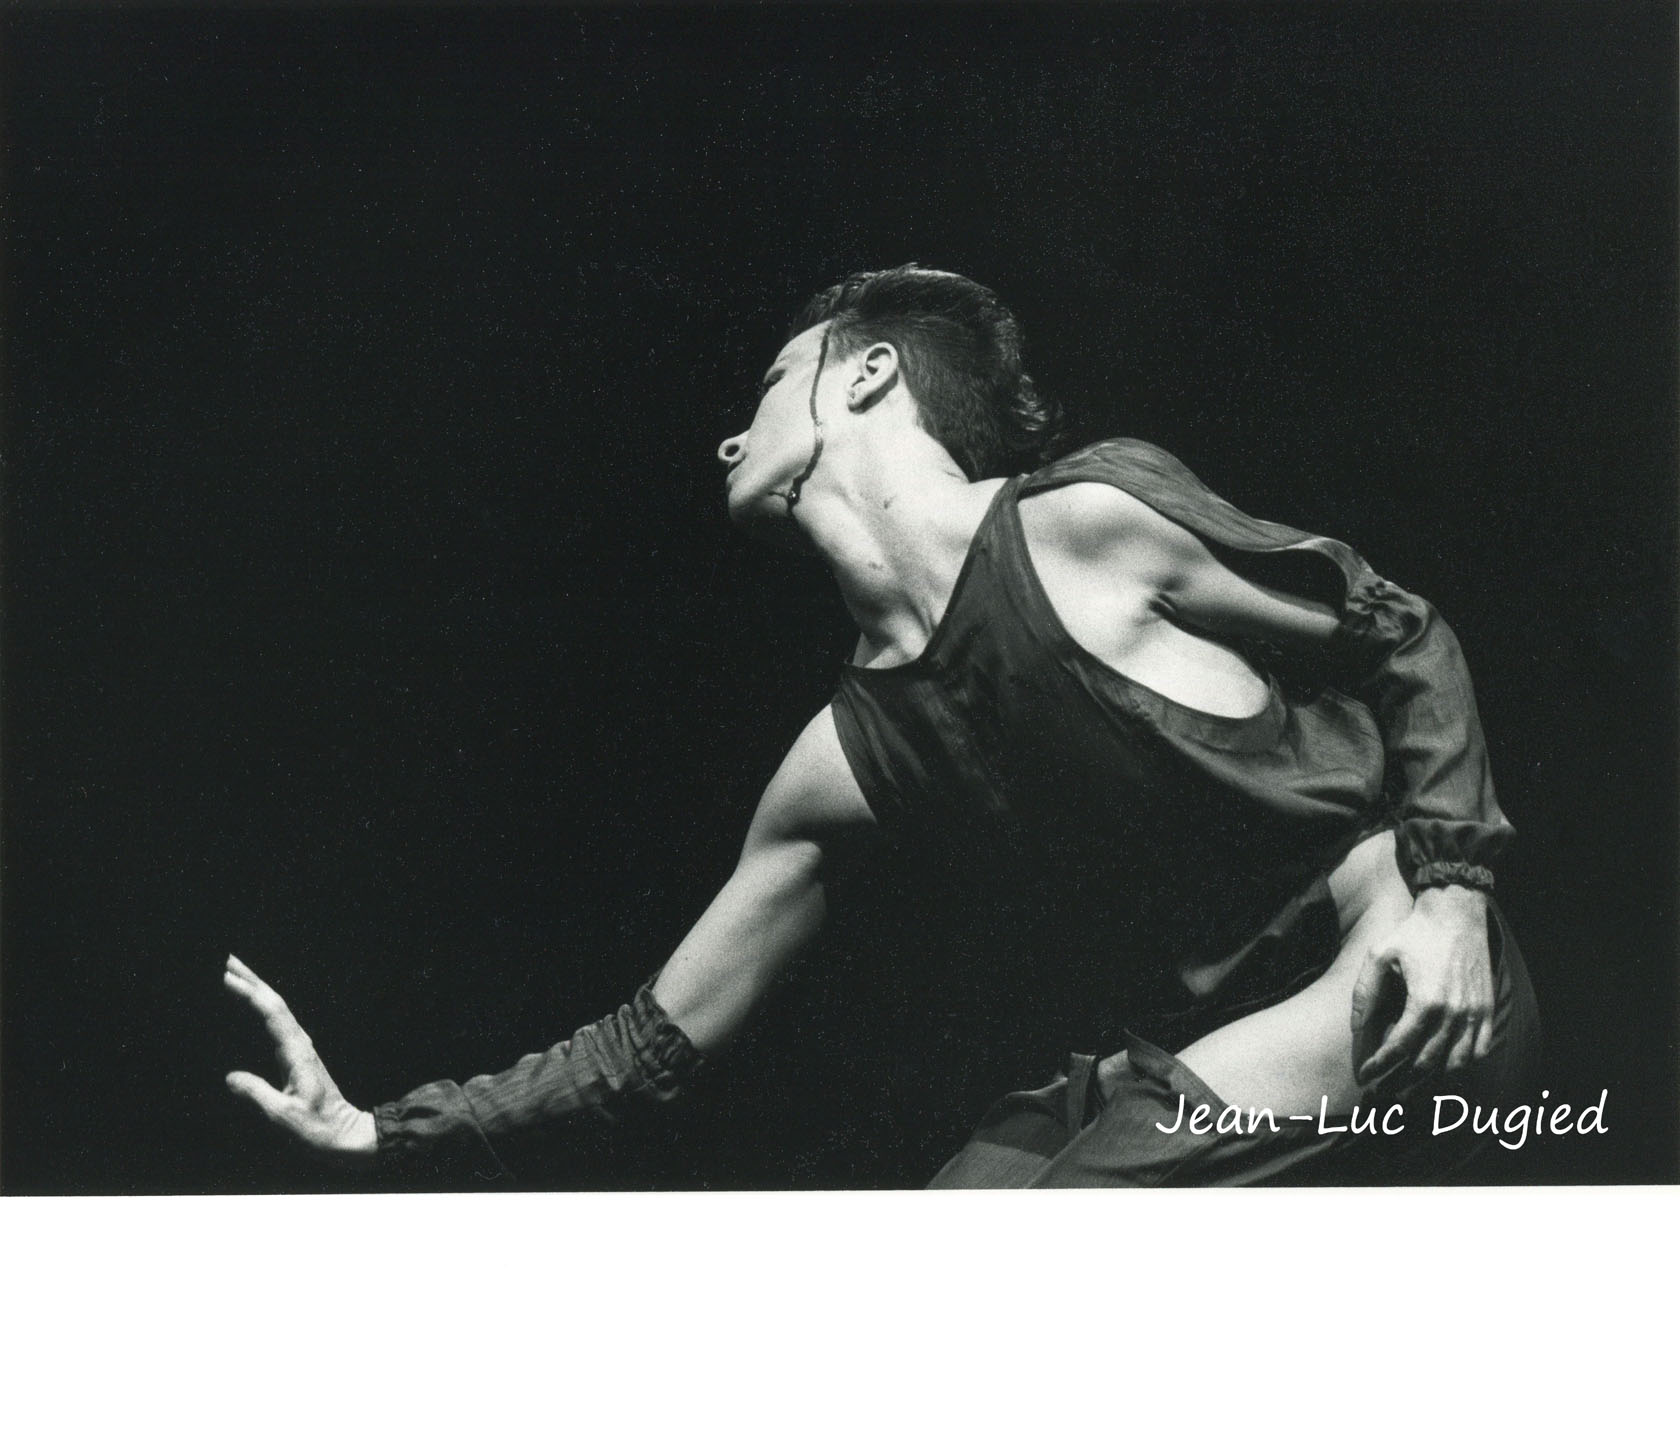 33 Glandier Bernard - basse altitude - Sylvie Giron - 1985